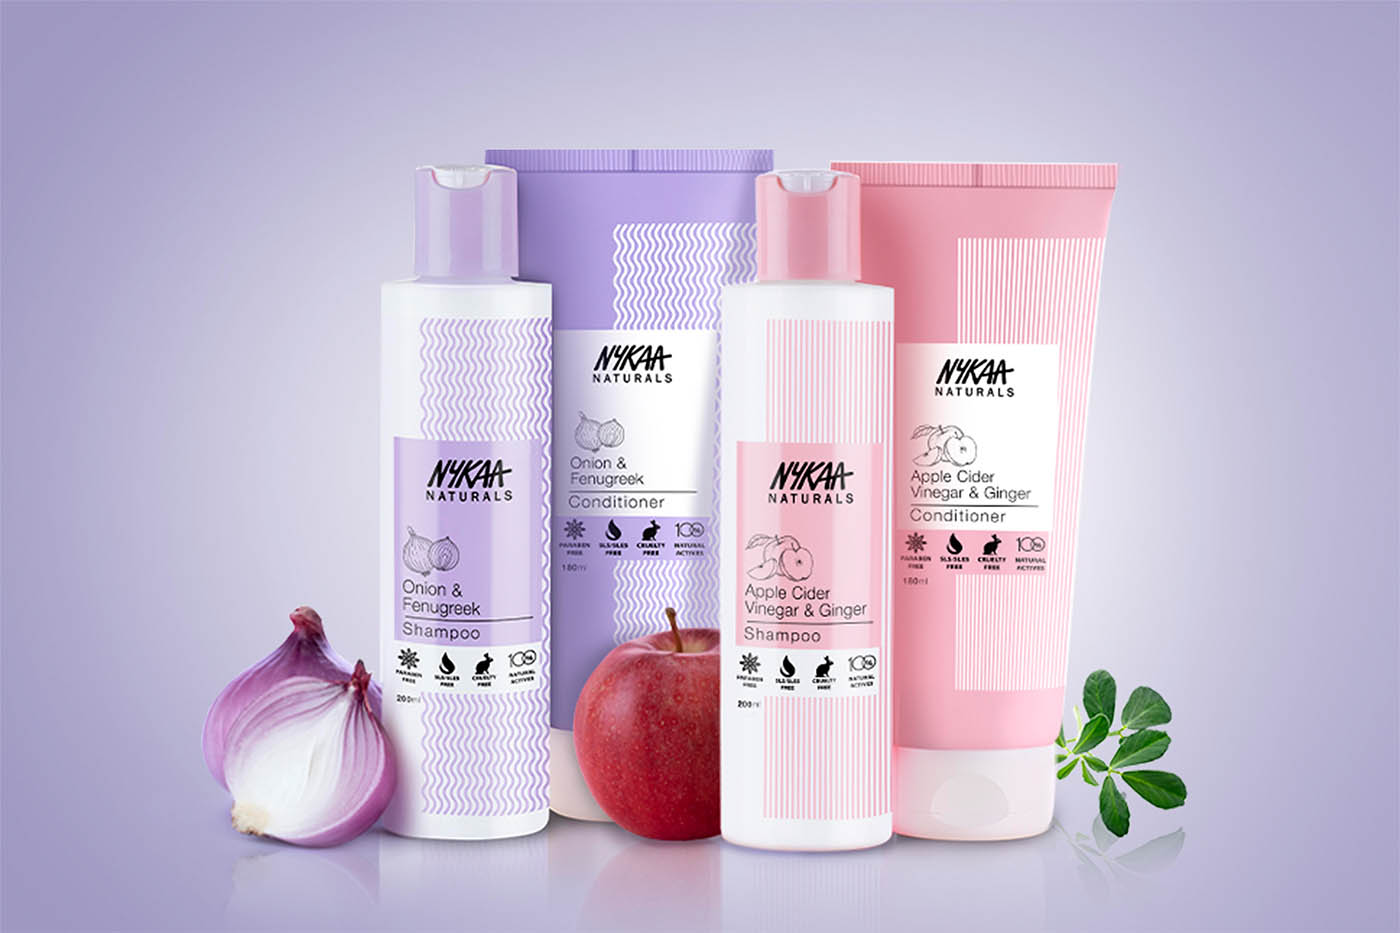 Nykaa introduces natural hair care